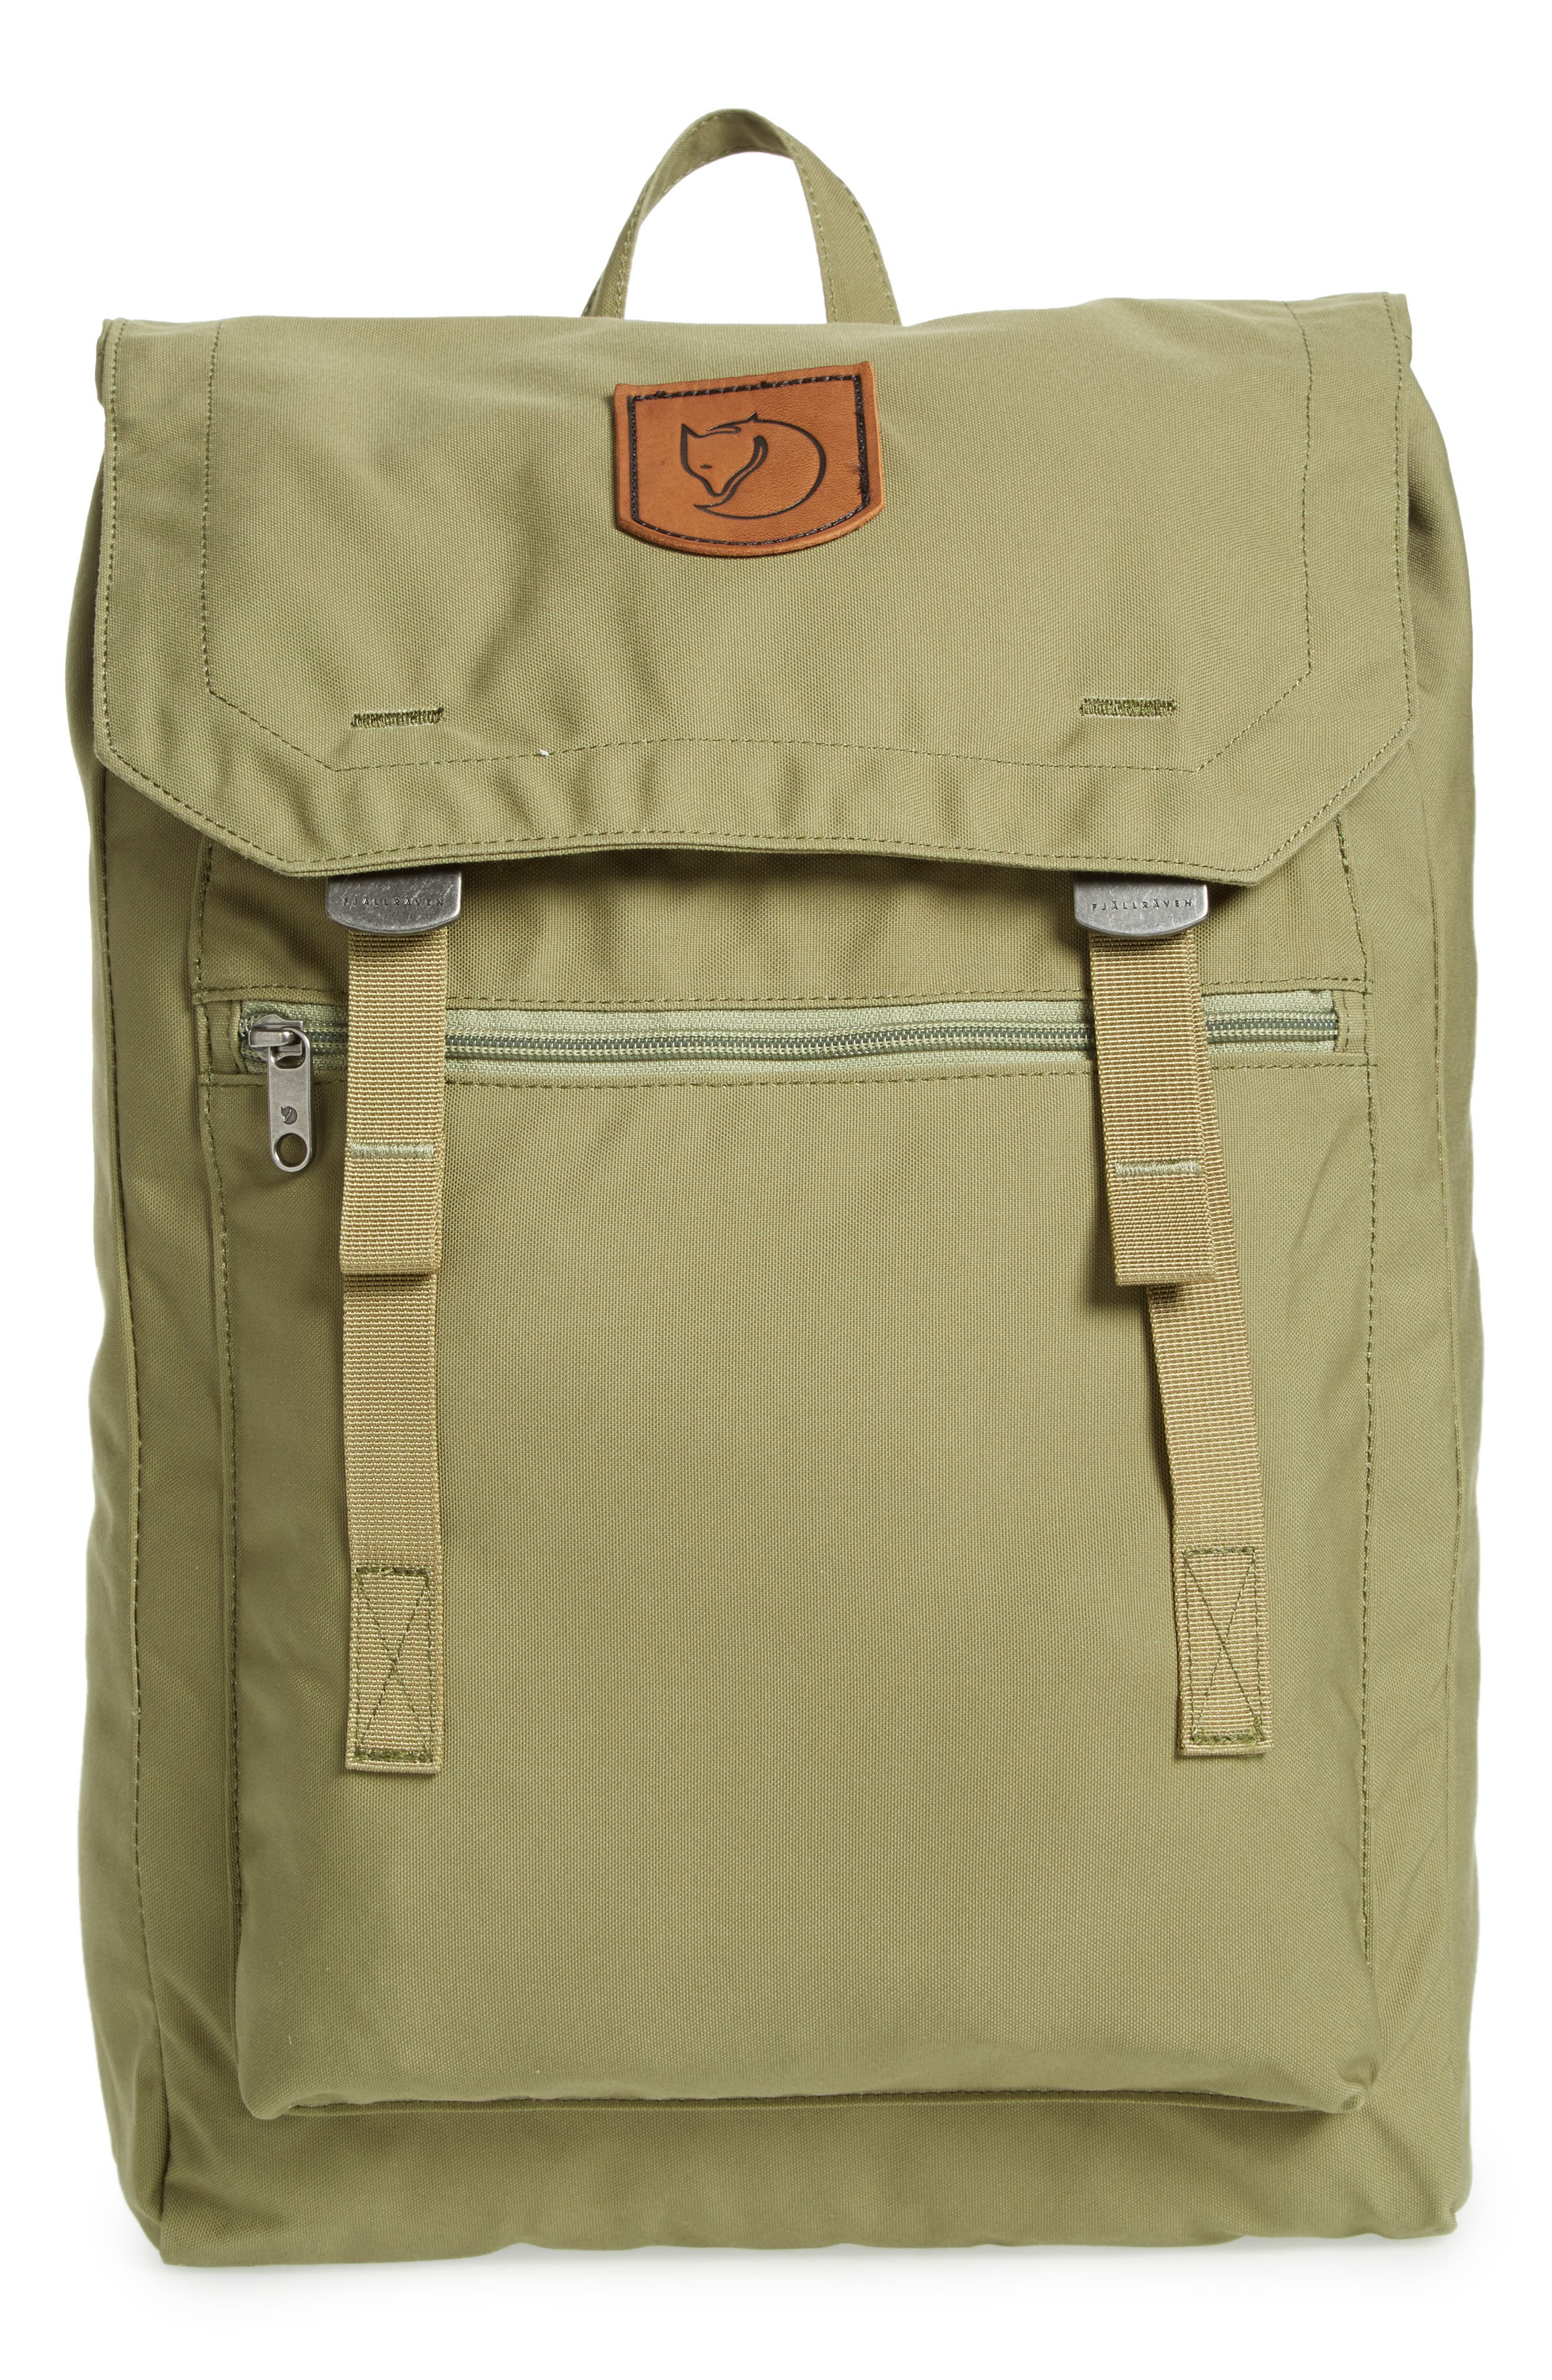 Alternate Image 1 Selected - Fjällräven Foldsack No.1 Water Resistant Backpack